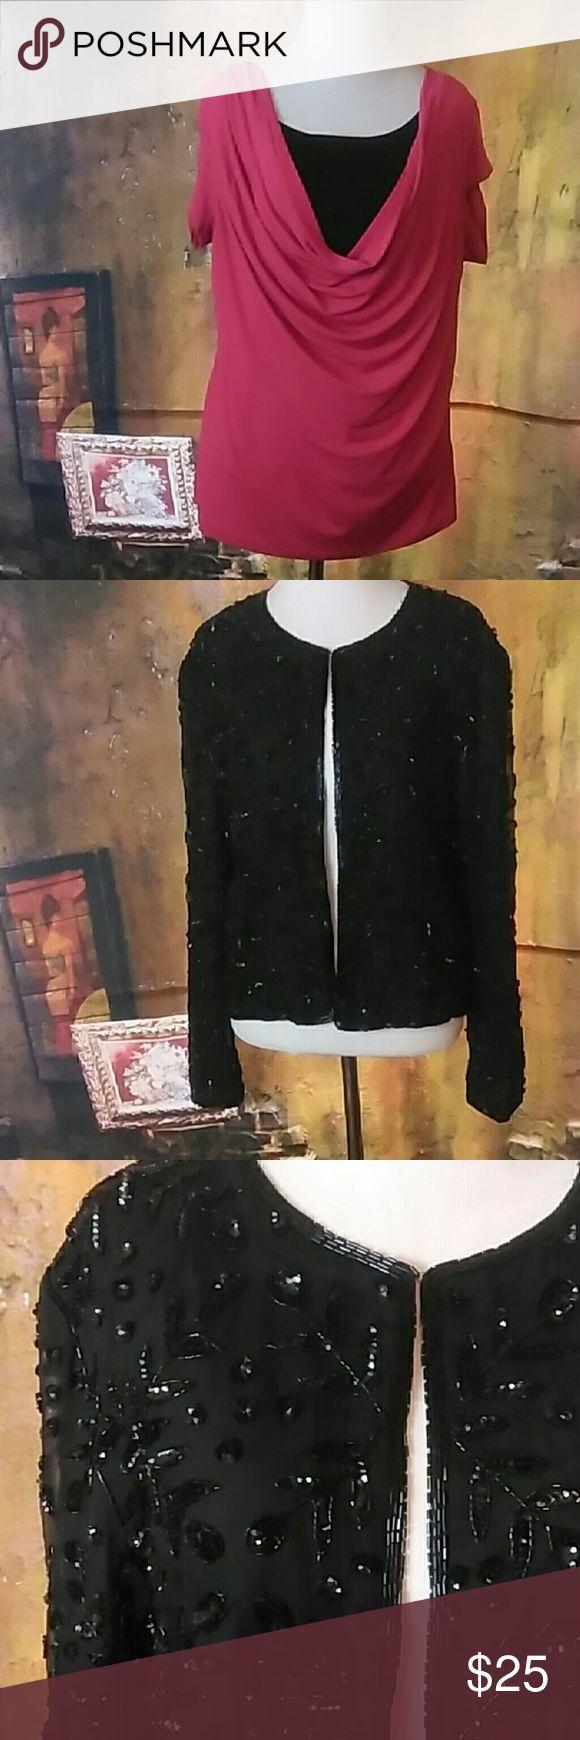 Night lite beaded jacket size M Black beaded jackets size M Night light Jackets & Coats